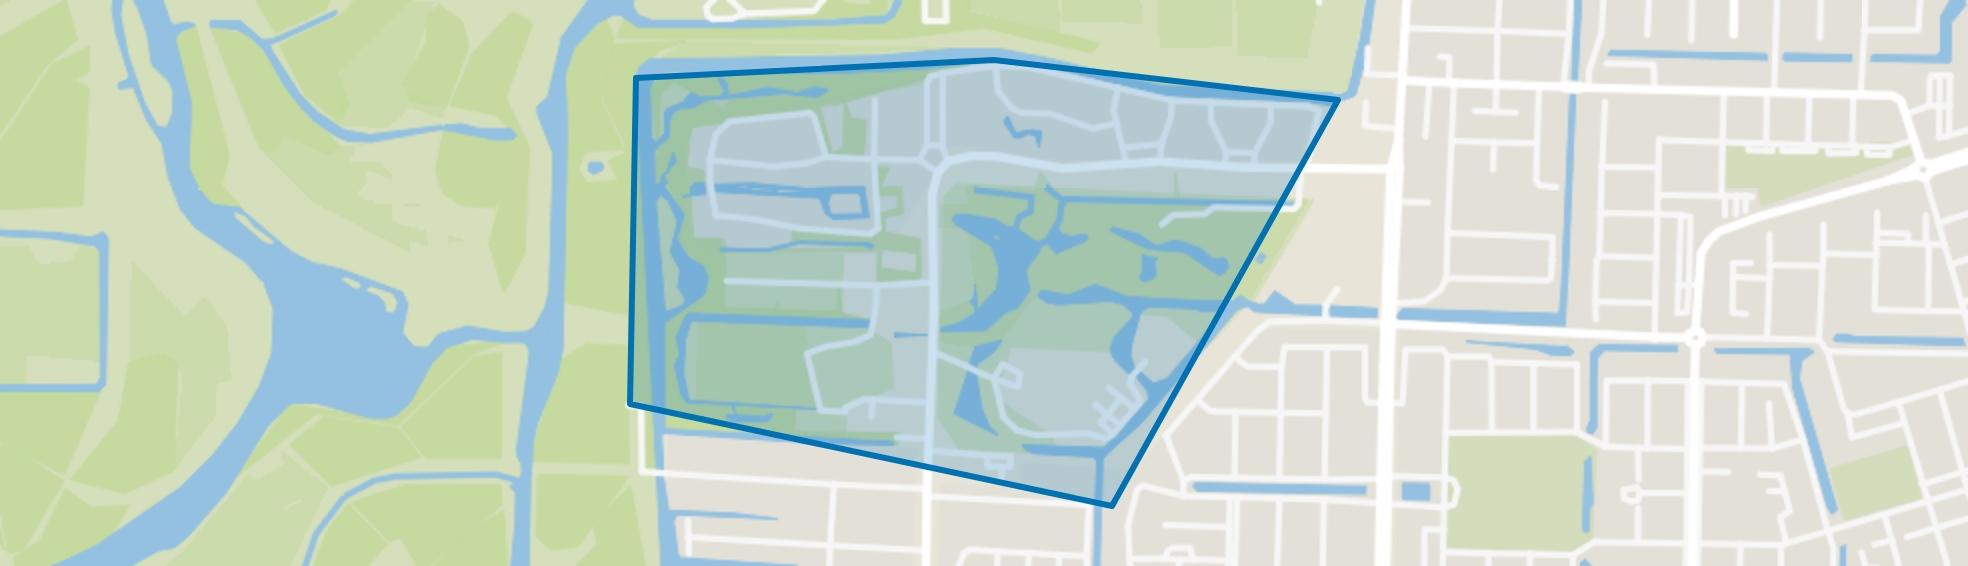 Oranjebuurt, Amstelveen map